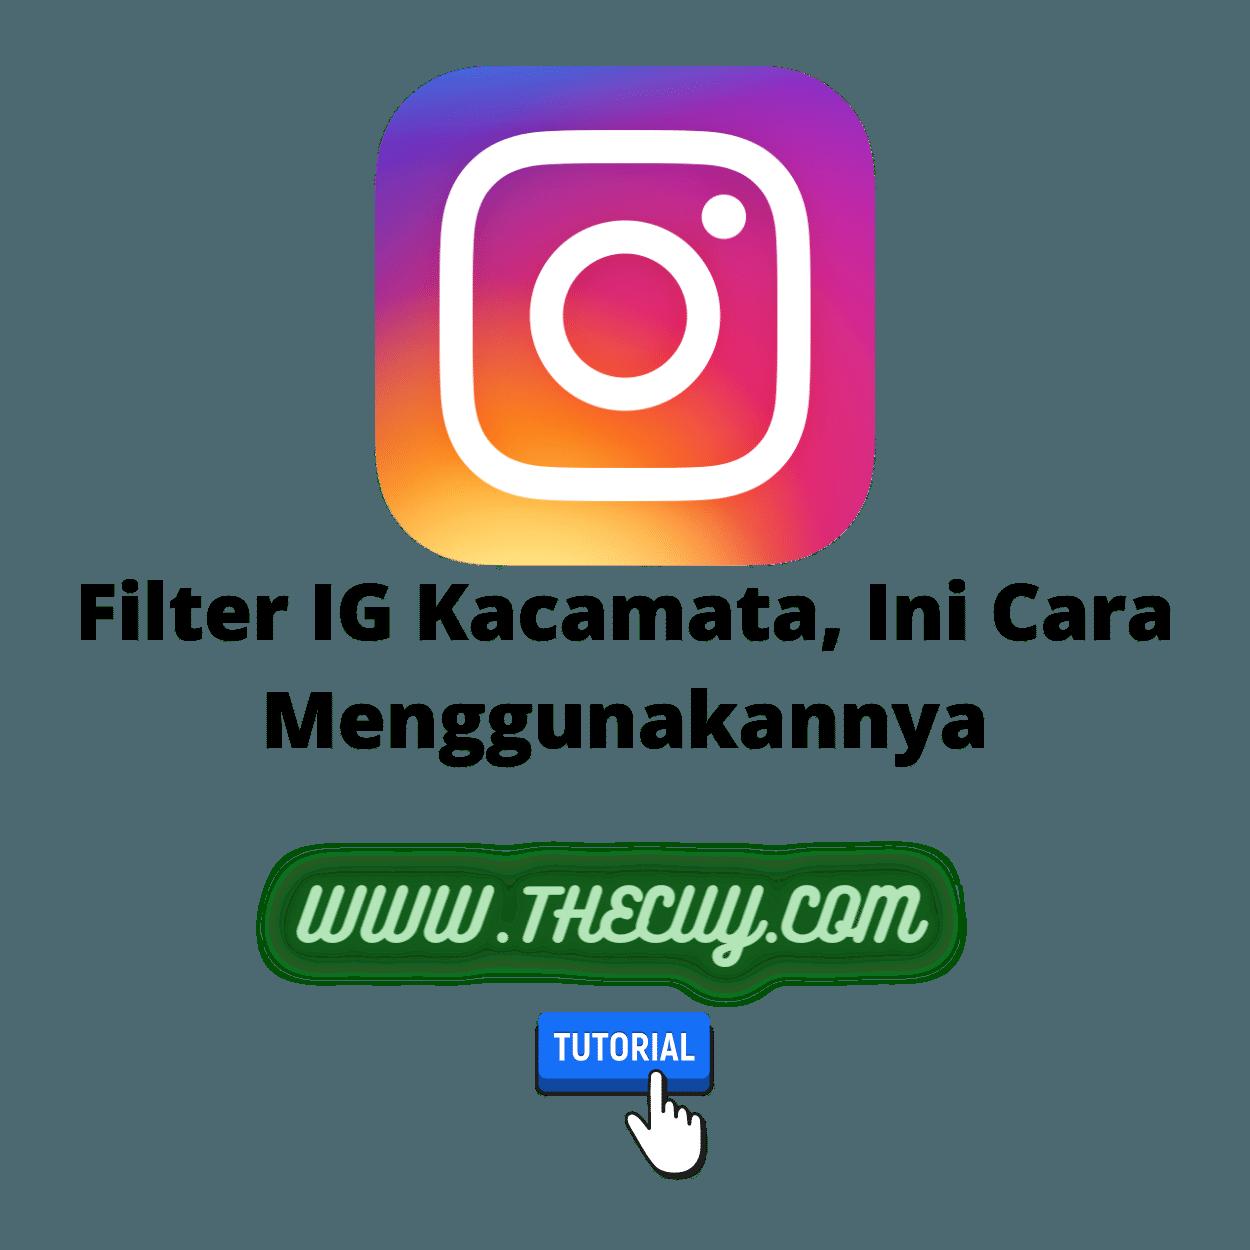 Filter IG Kacamata, Ini Cara Menggunakannya